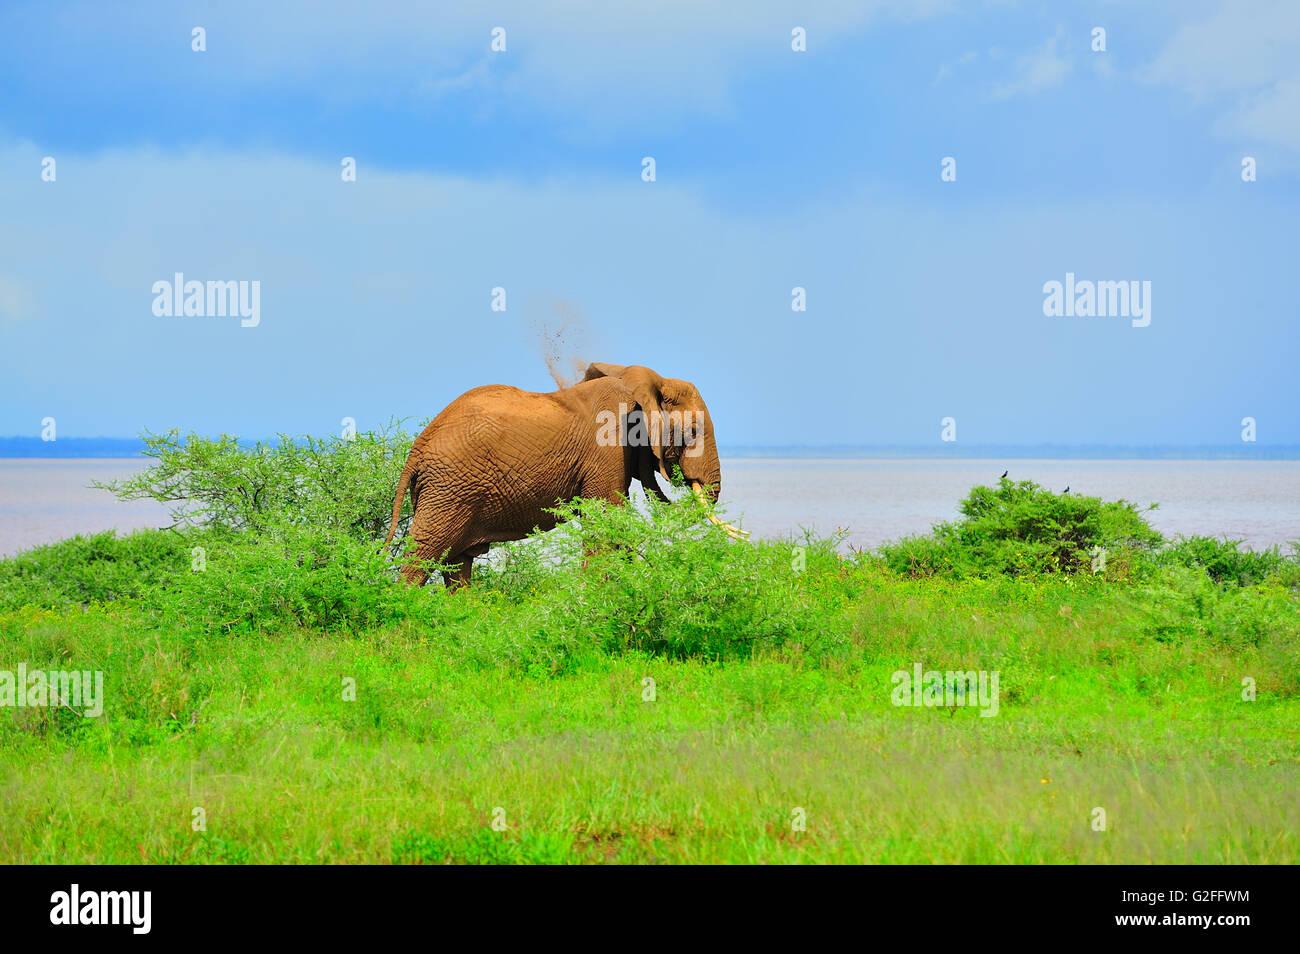 Elephant taking a dust shower at the shore of Lake Manyara - Stock Image